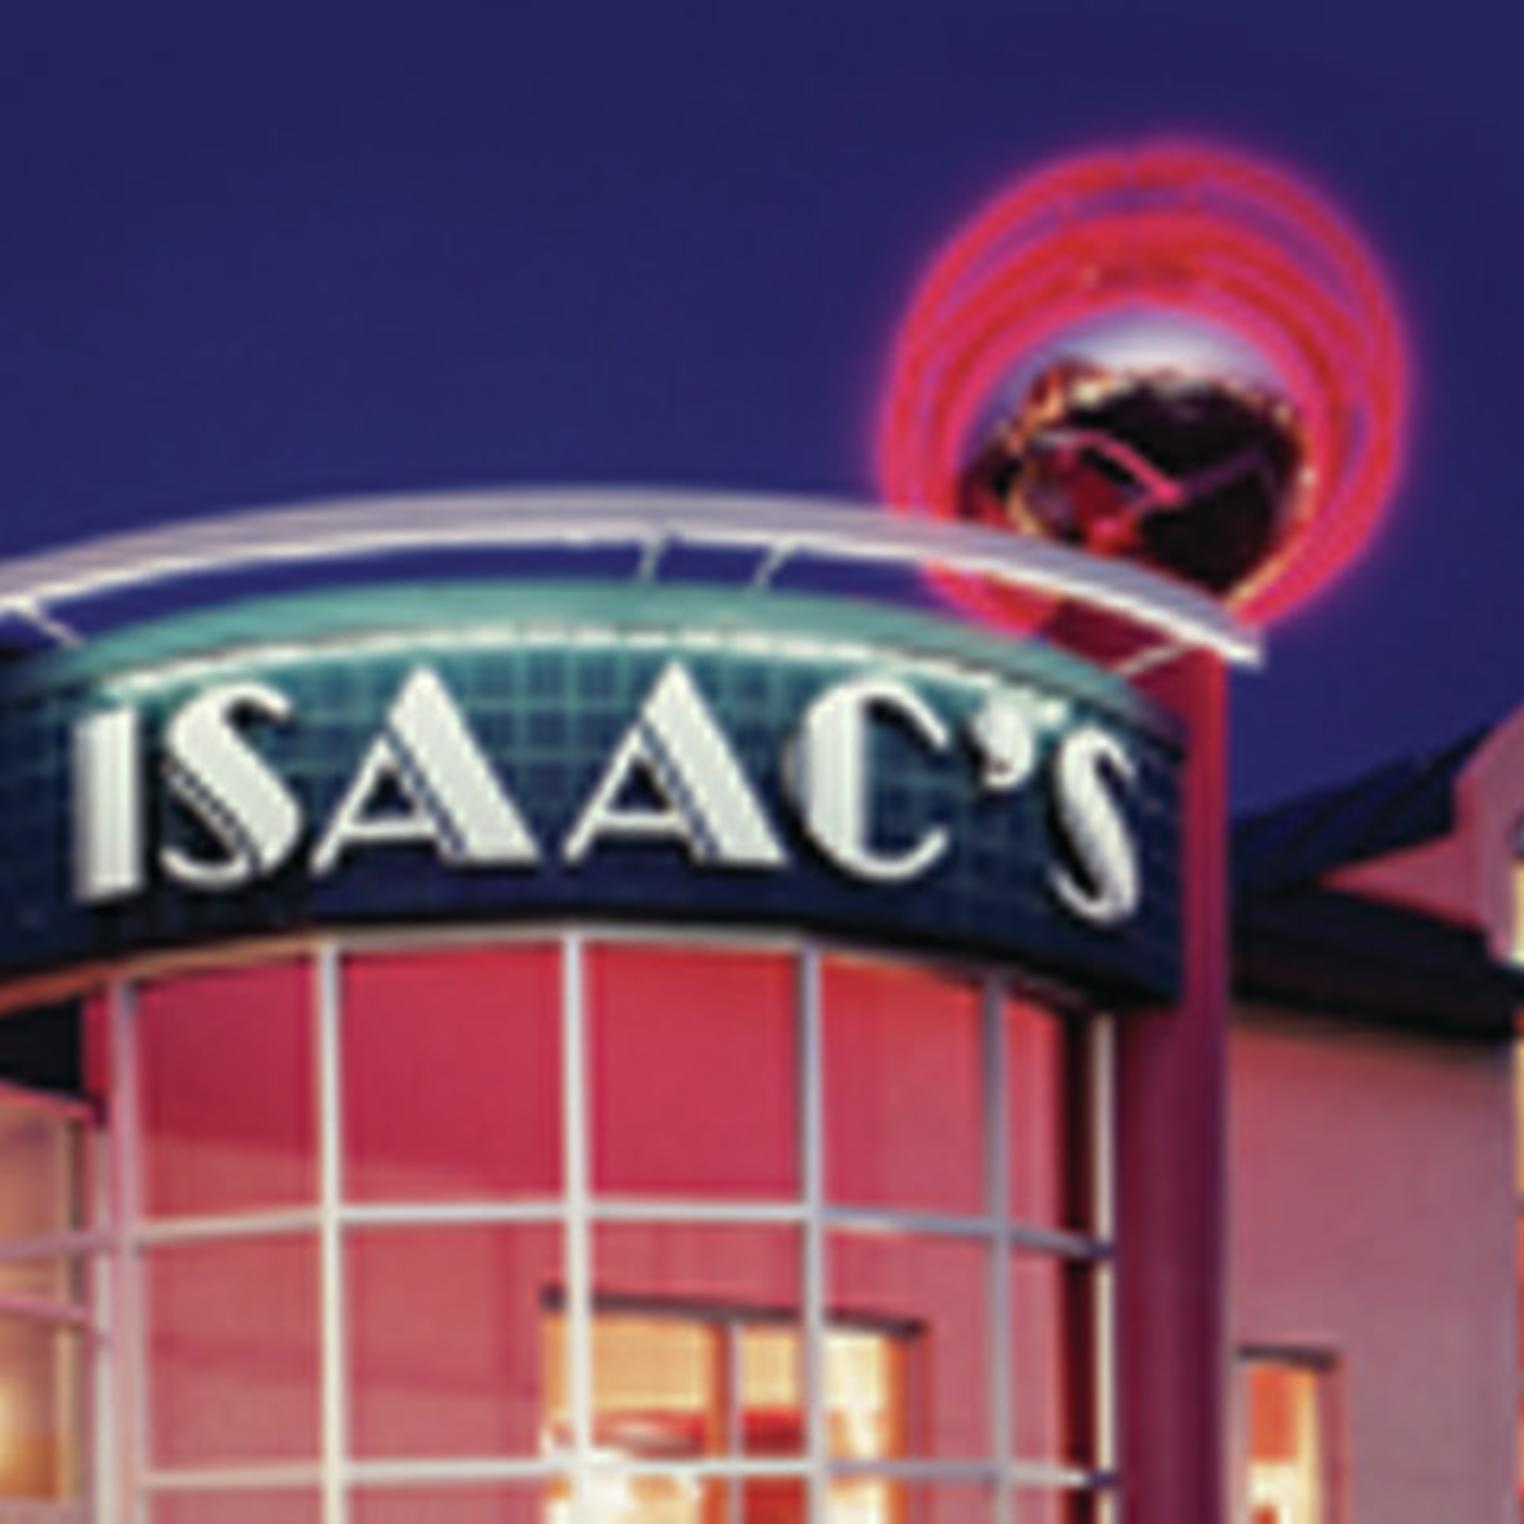 Isaac's